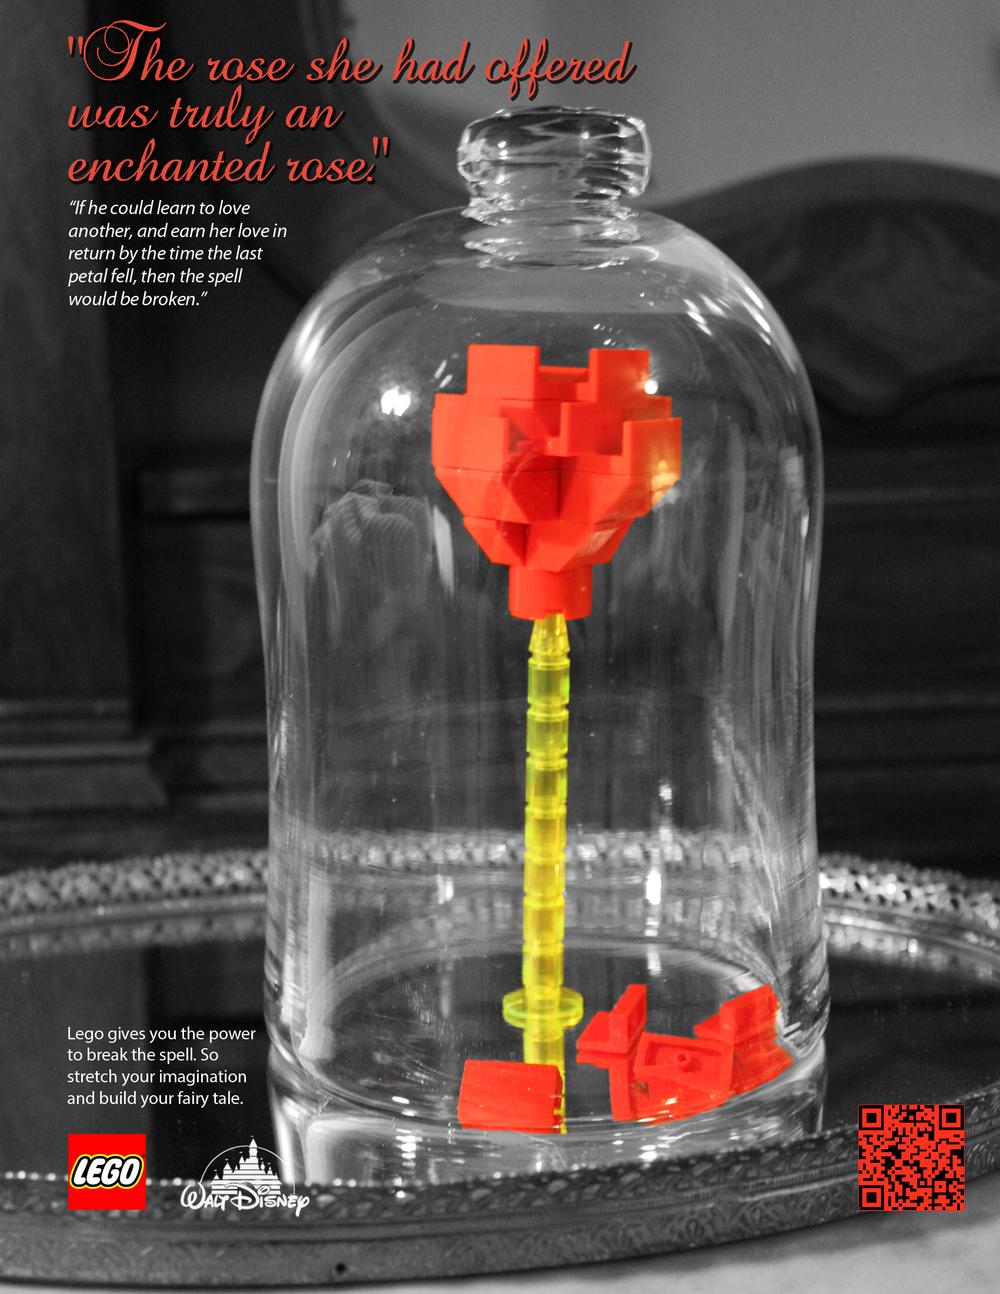 Lego_BeautyandtheBeastad_v2.jpg